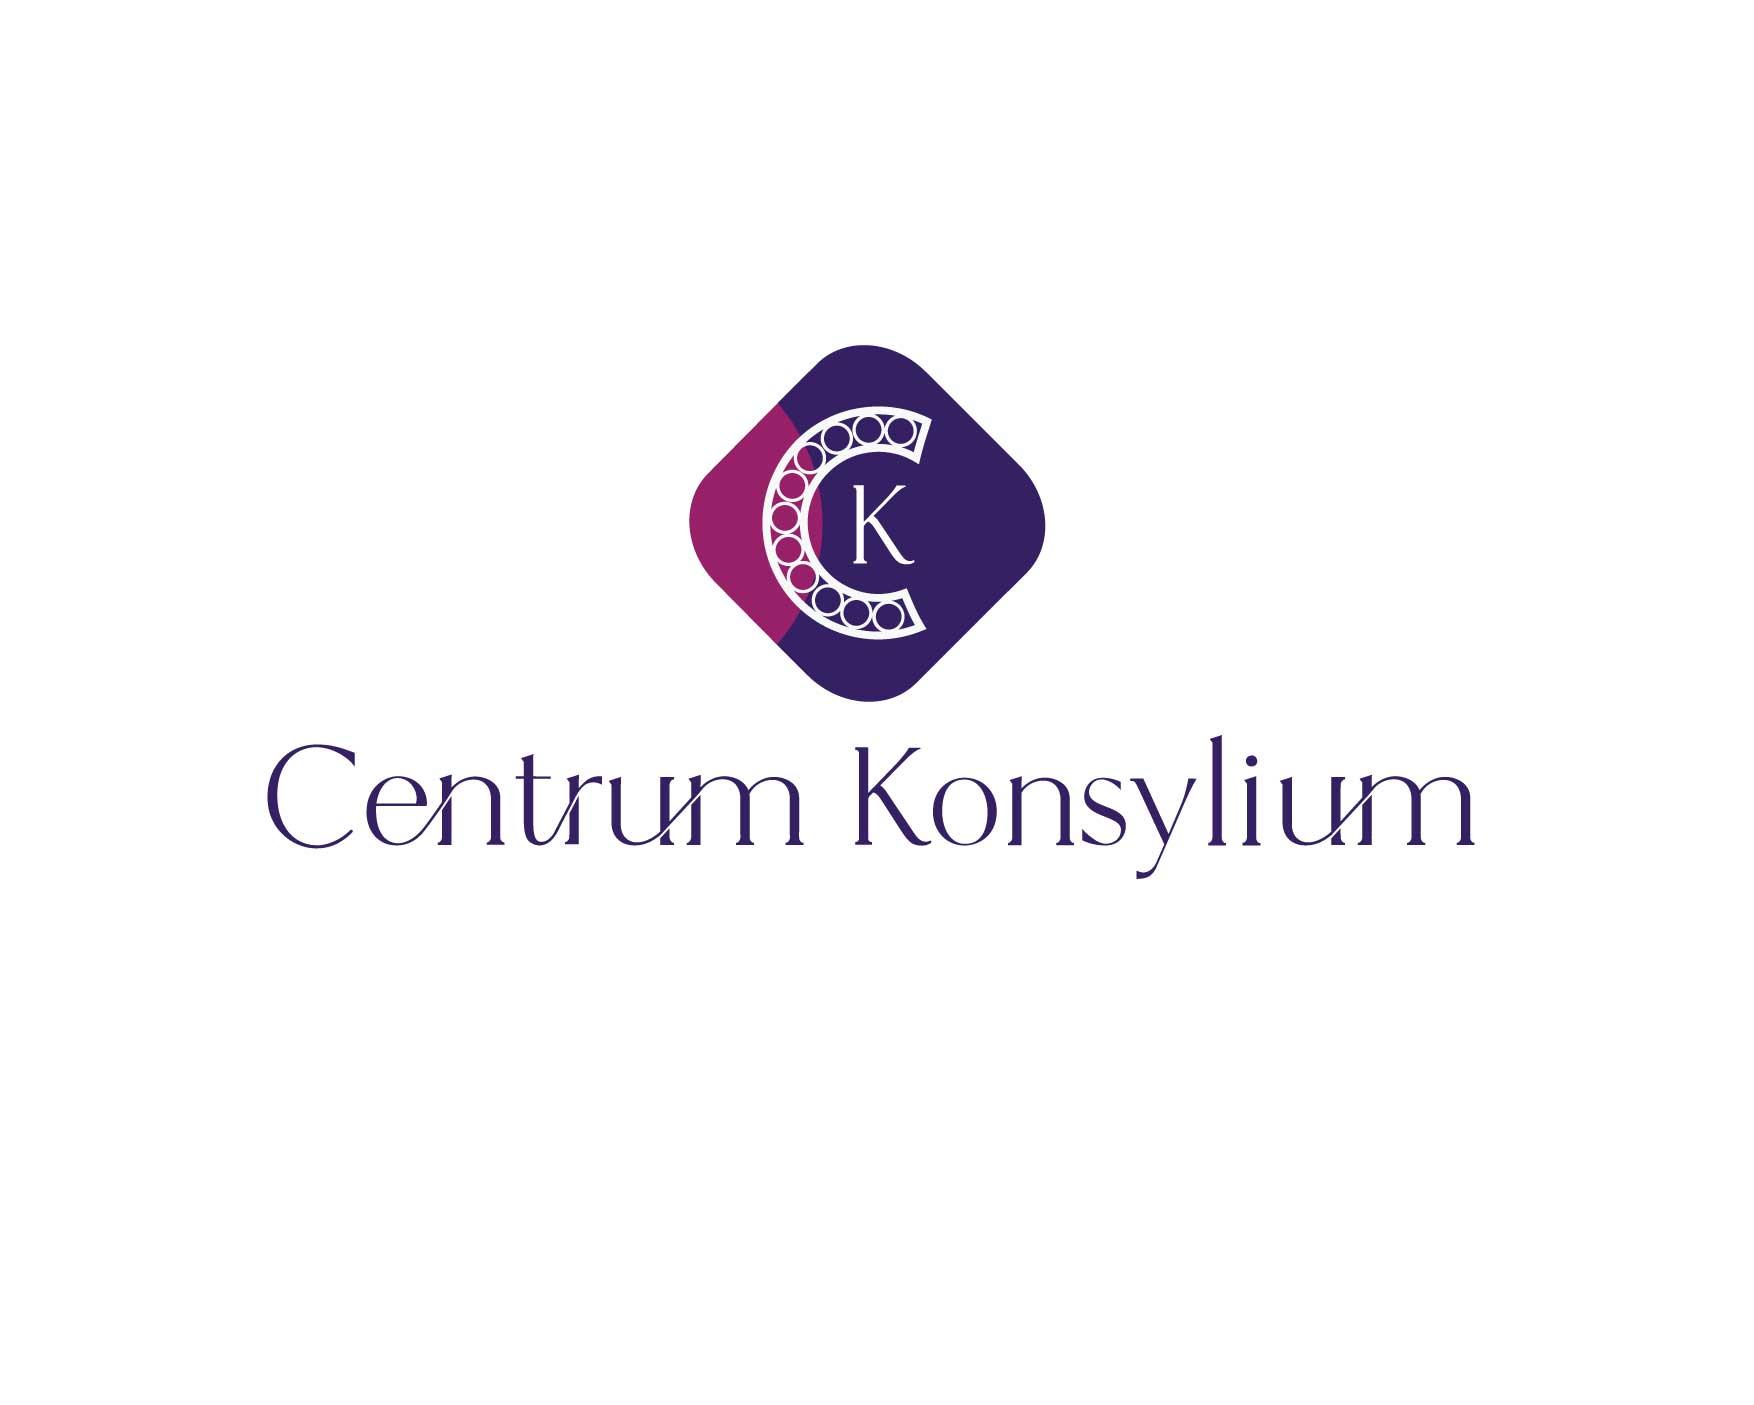 centrum konsylium